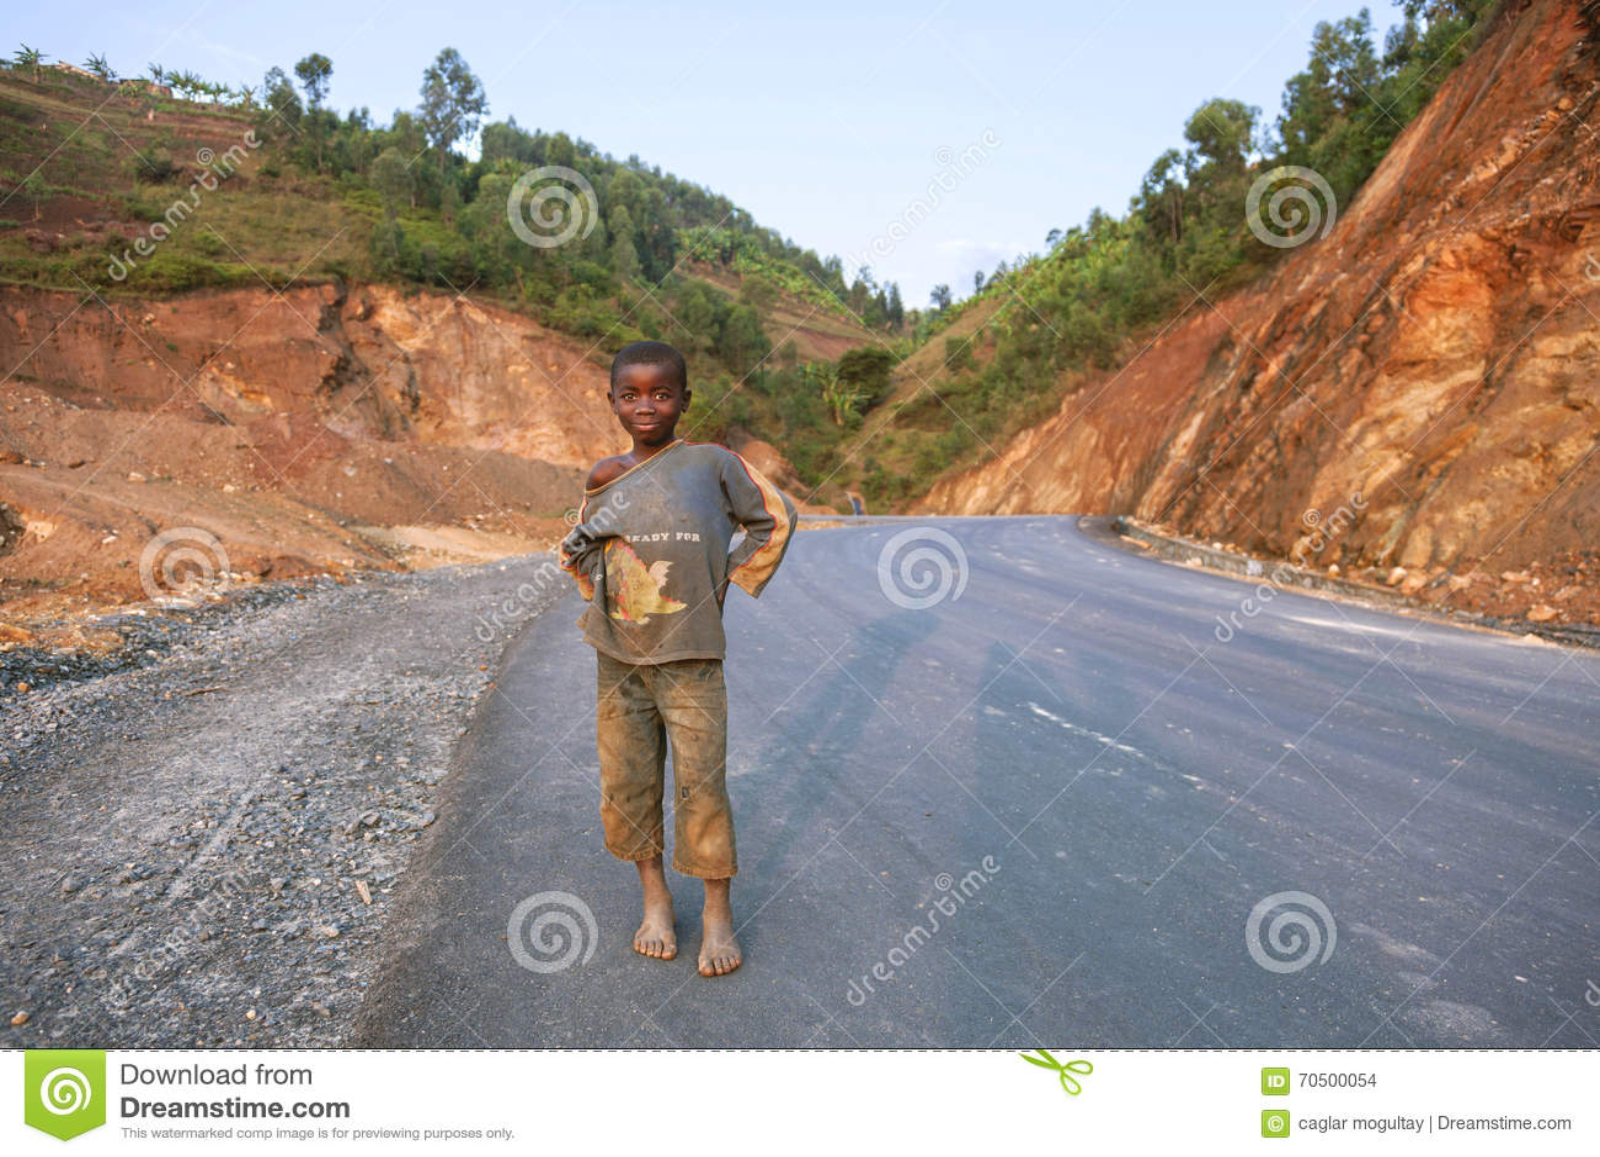 child naked  KIGALI, RWANDA - SEPTEMBER 6, 2015: Unidentified child. A child on the